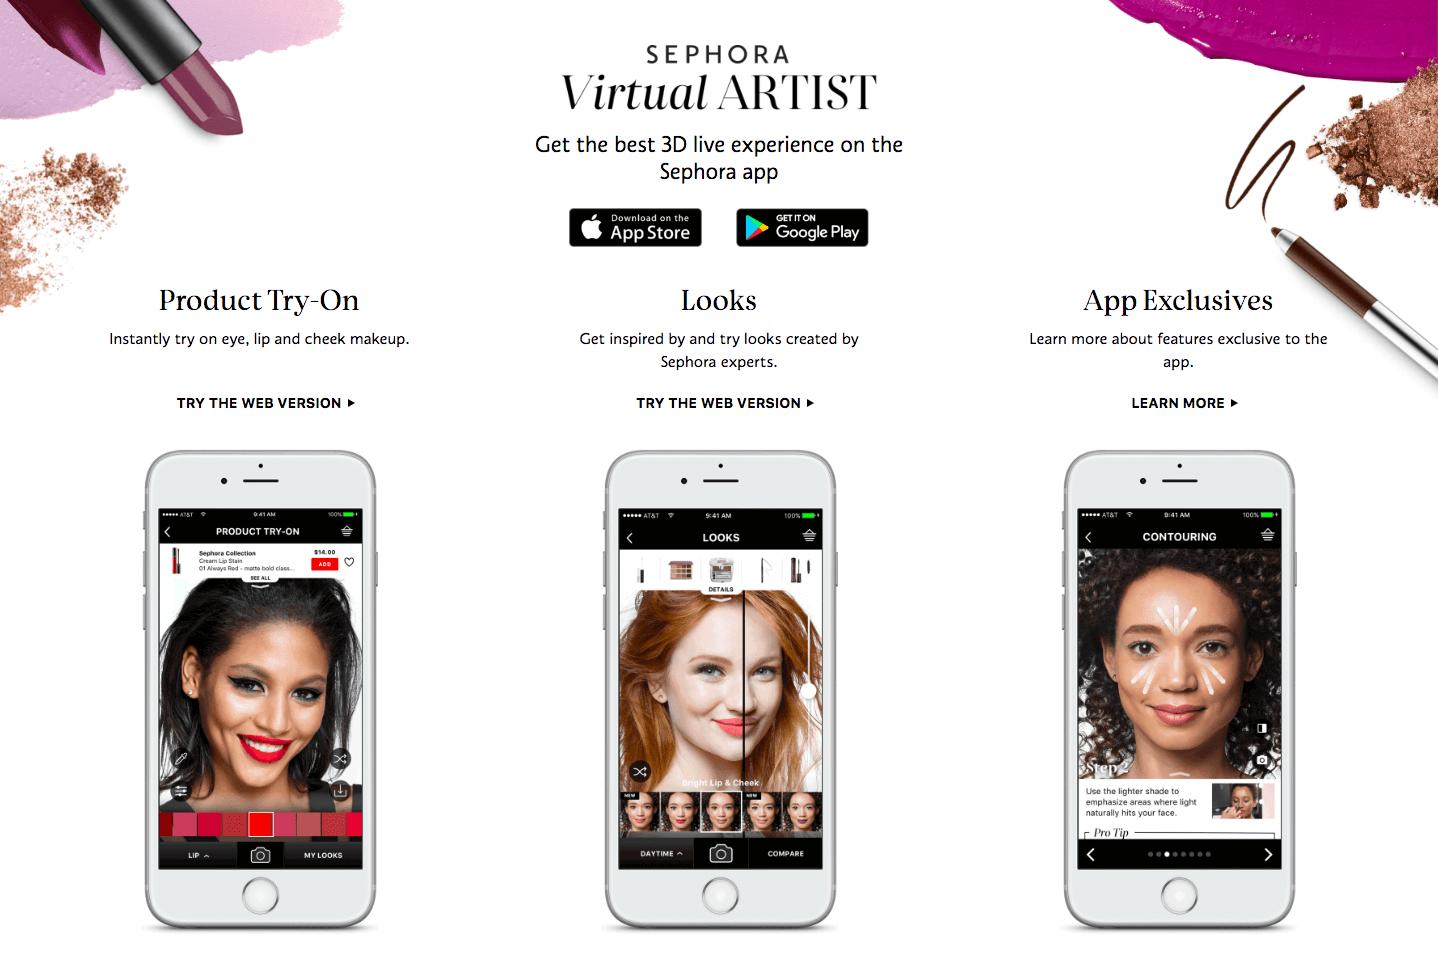 Best Customer Experiences Sephora Virtual Artist